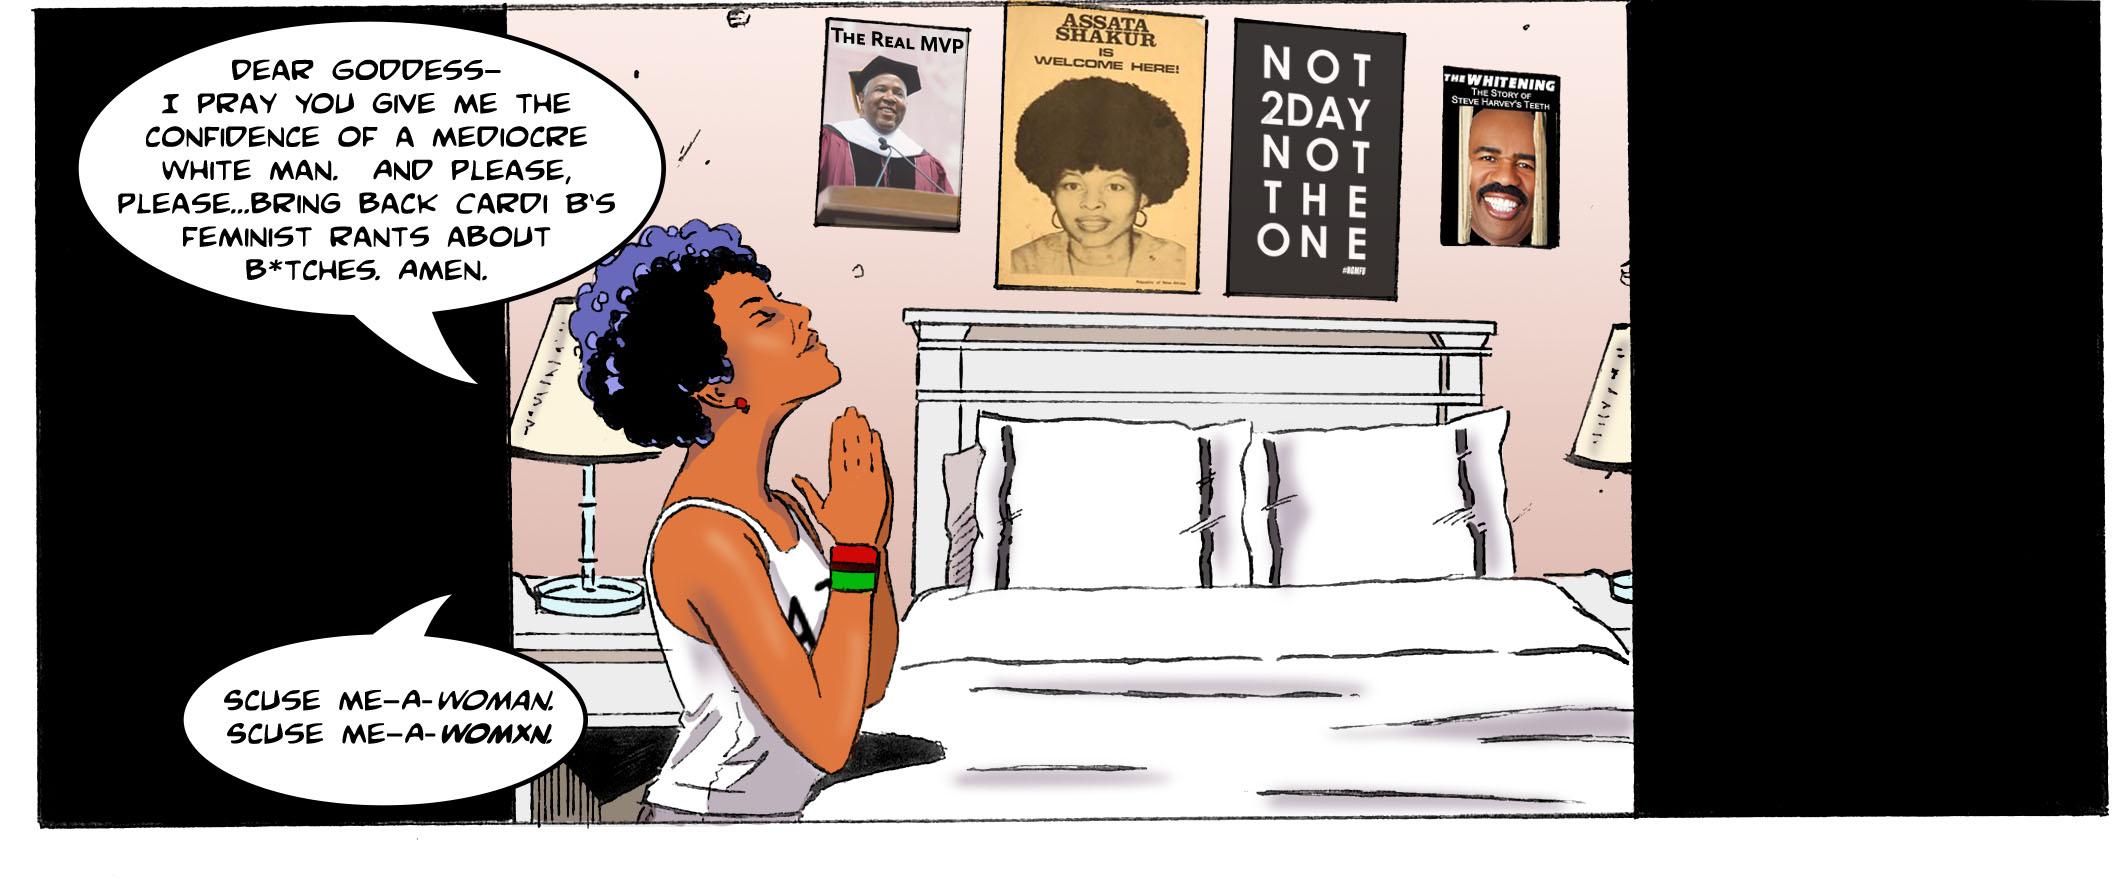 (H)af Comic Strip #91.jpg